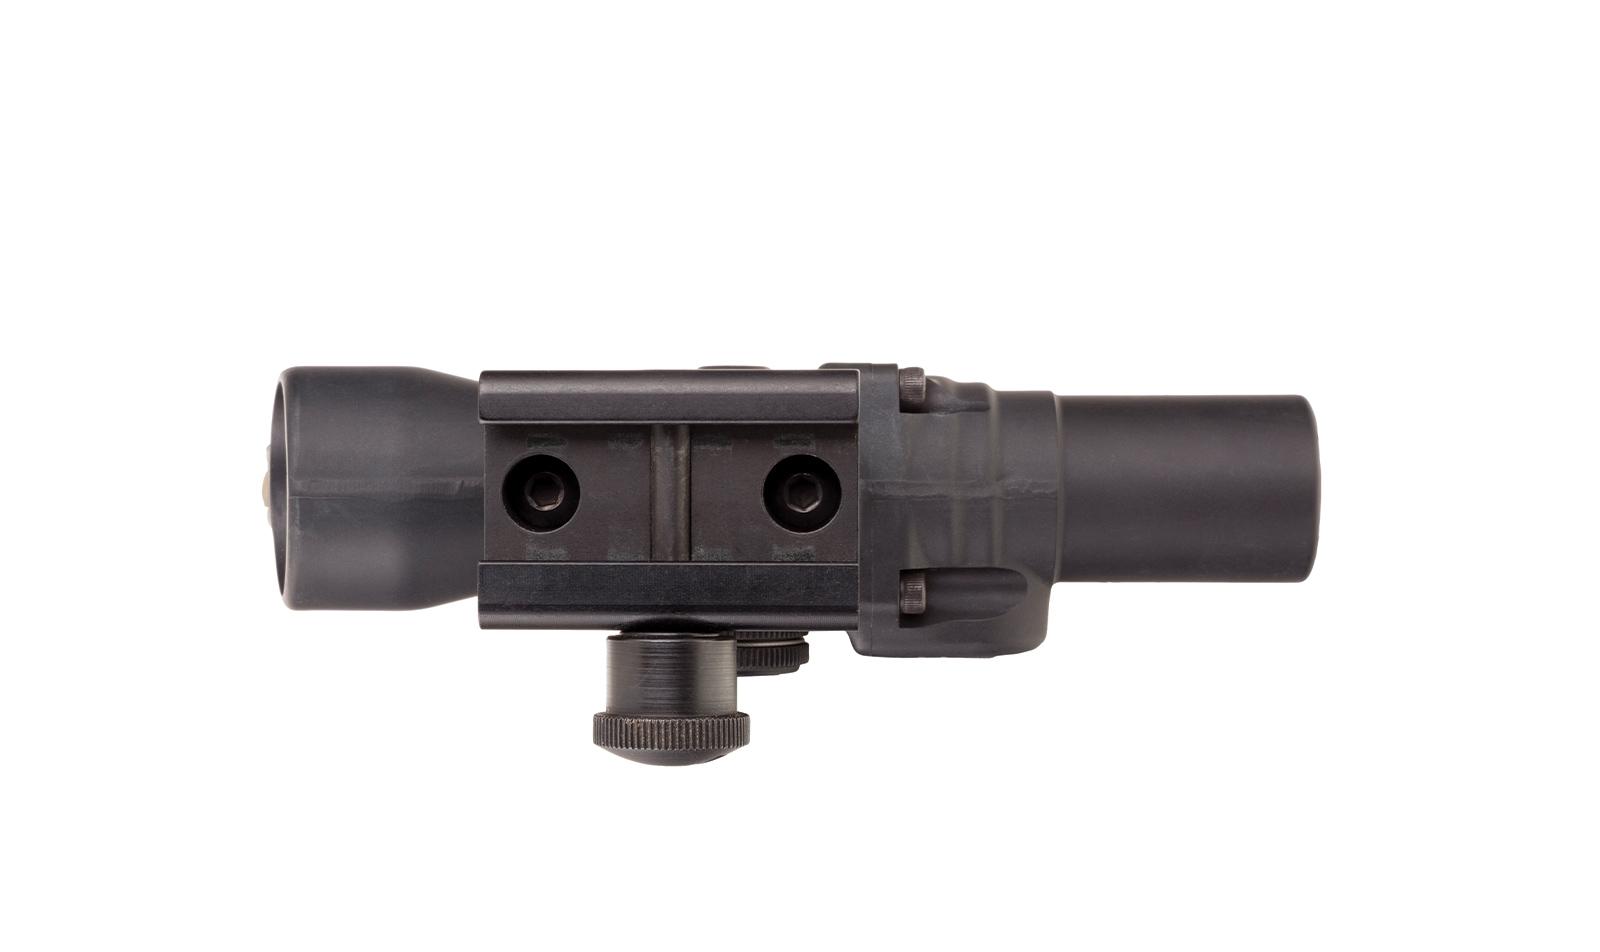 TA45-C-400154 angle 9